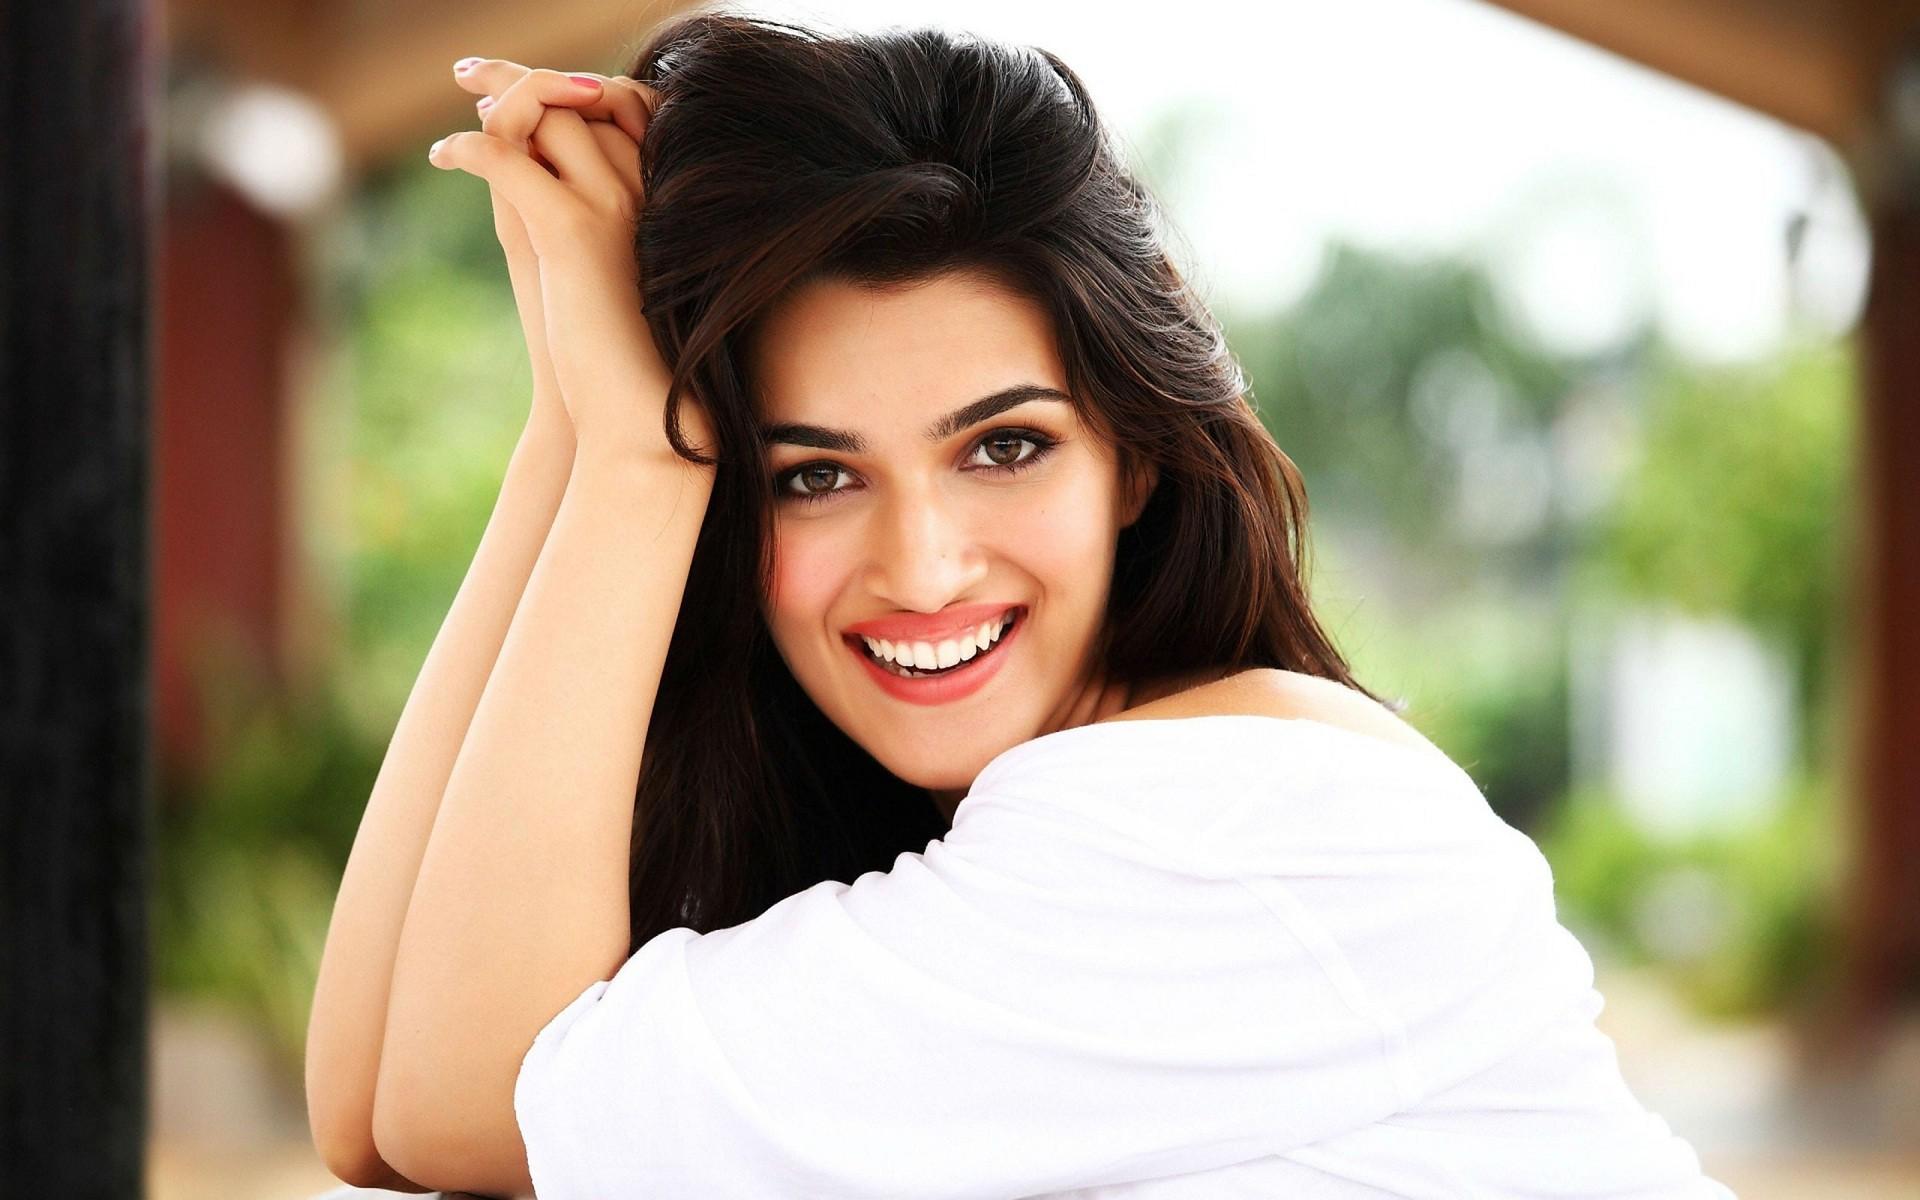 Kriti Sanon Smiling, HD Indian Celebrities, 4k Wallpapers